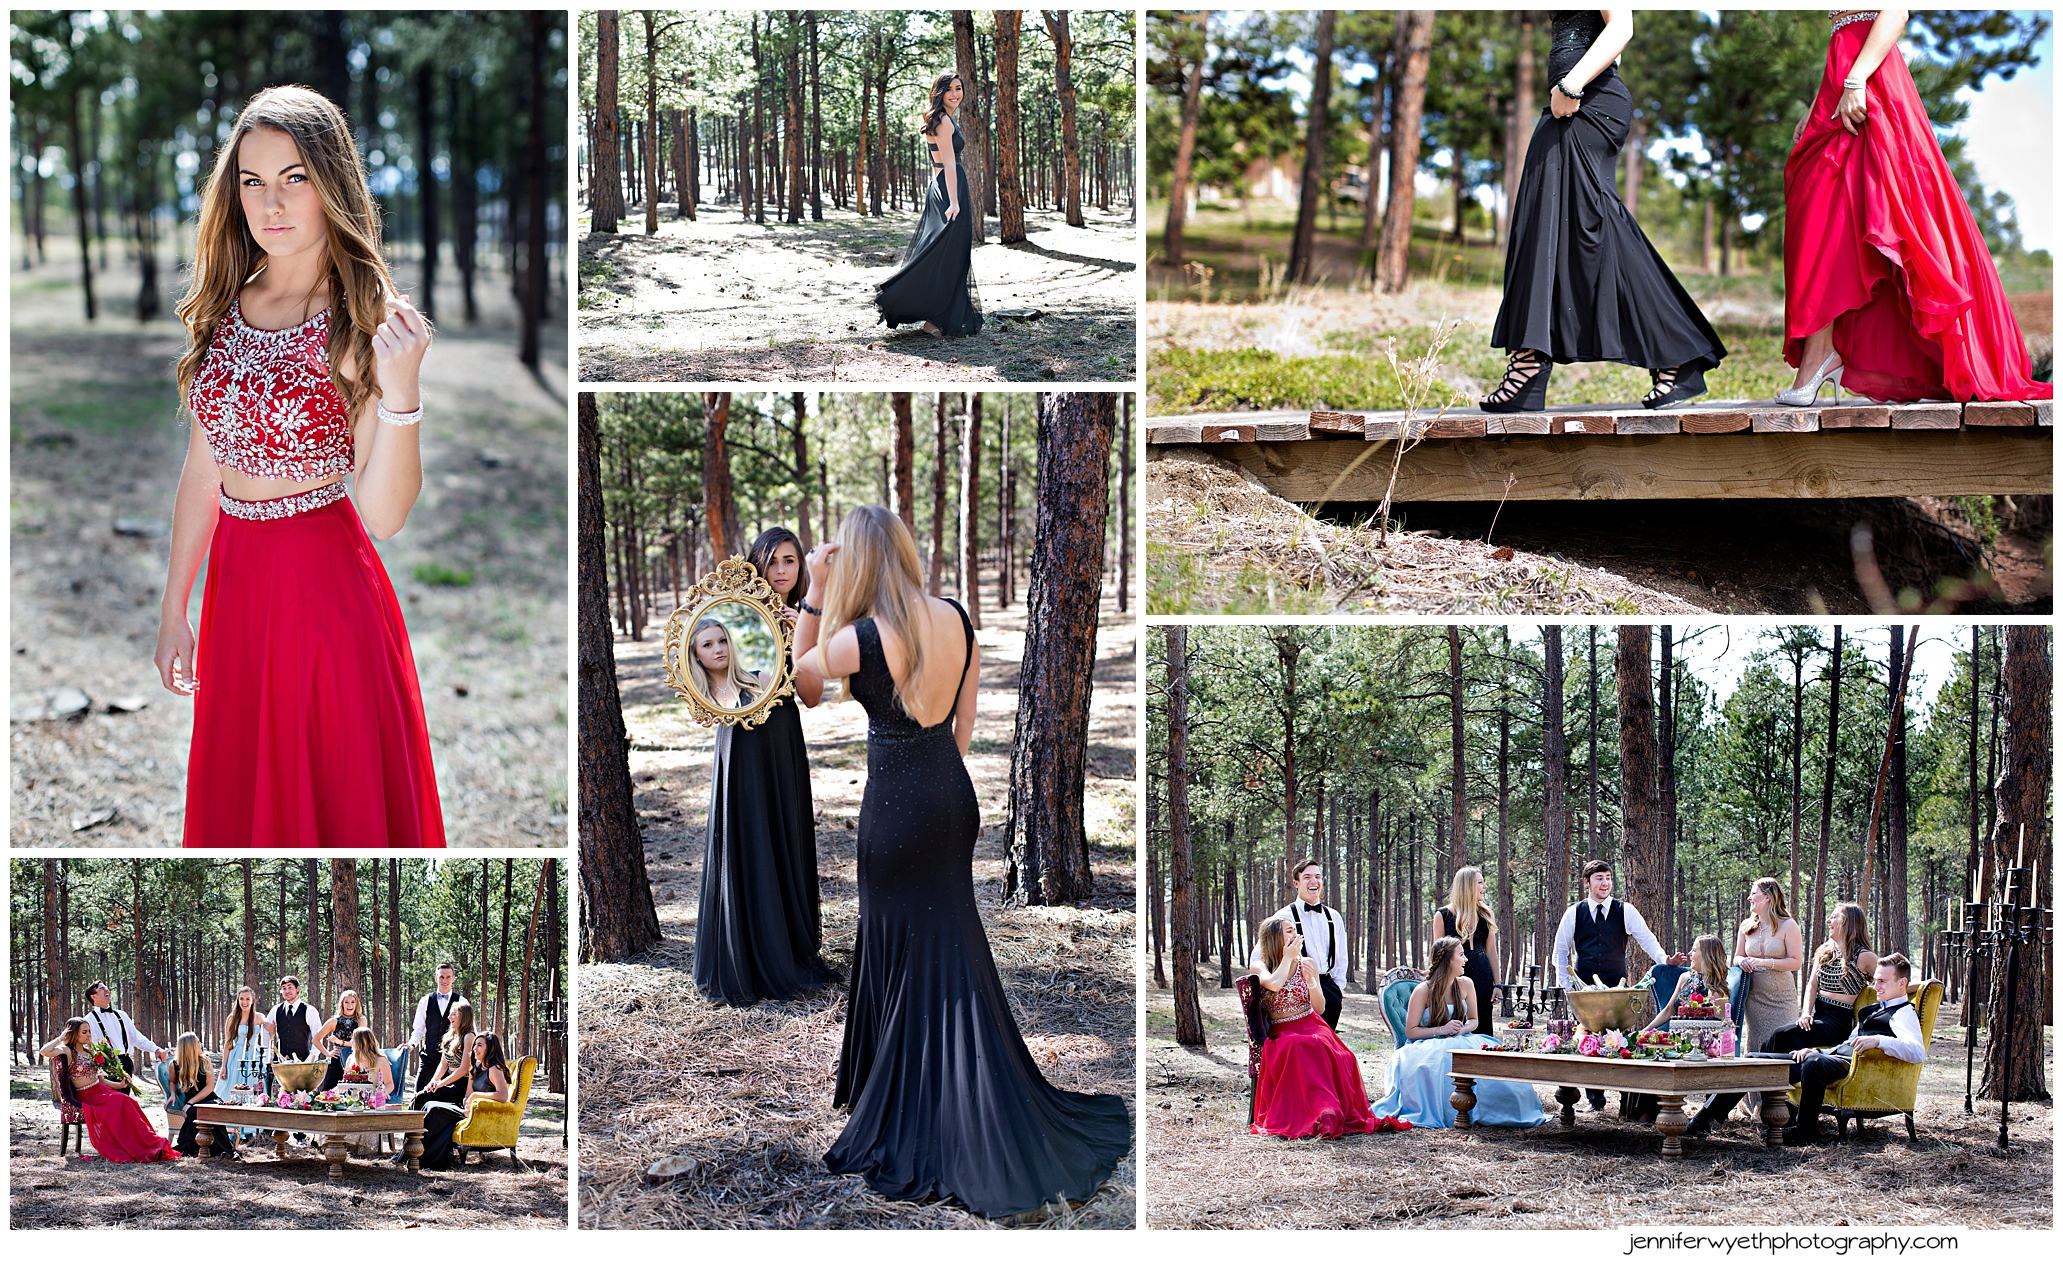 Jennifer-Wyeth-photography-senior-pictures-colorado-springs-photographer_0143.jpg